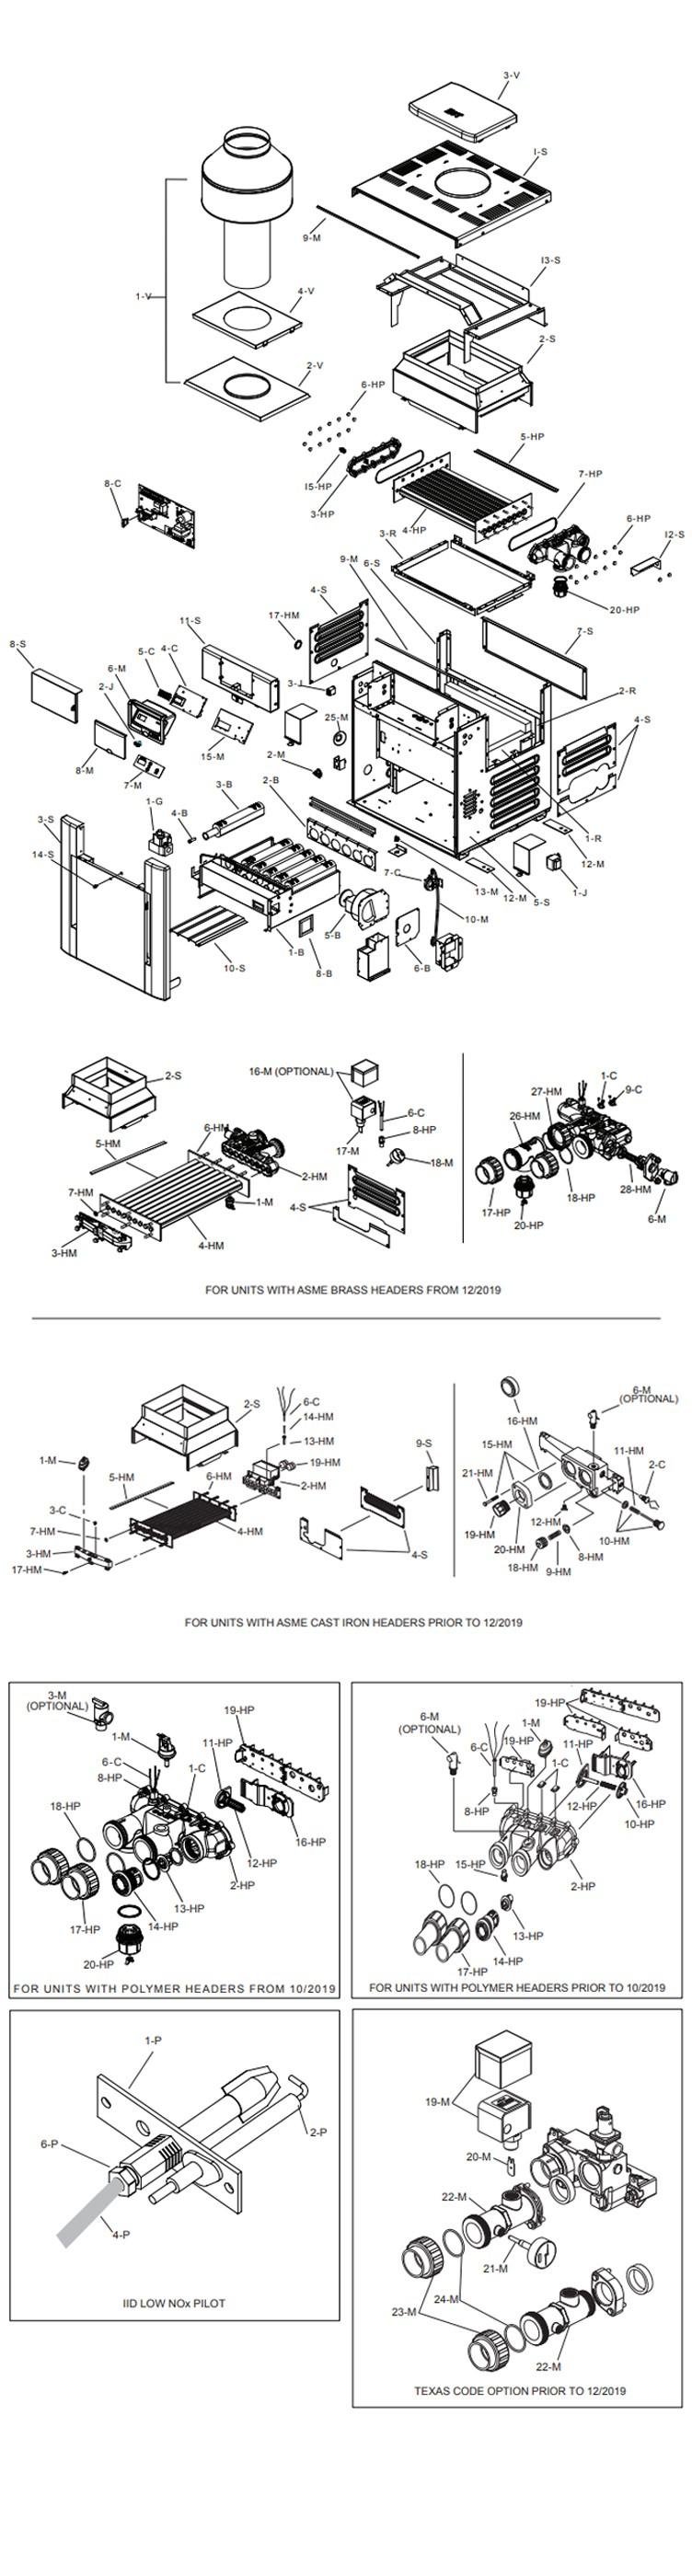 Raypak Digital Low NOx ASME Natural Gas Commercial Swimming Pool Heater   333k BTU Cupro Nickel Exchanger   Altitude 0-5000 Ft   C-R337A-EN-X 010229   B-R337A-EN-X #26 017711 Parts Schematic